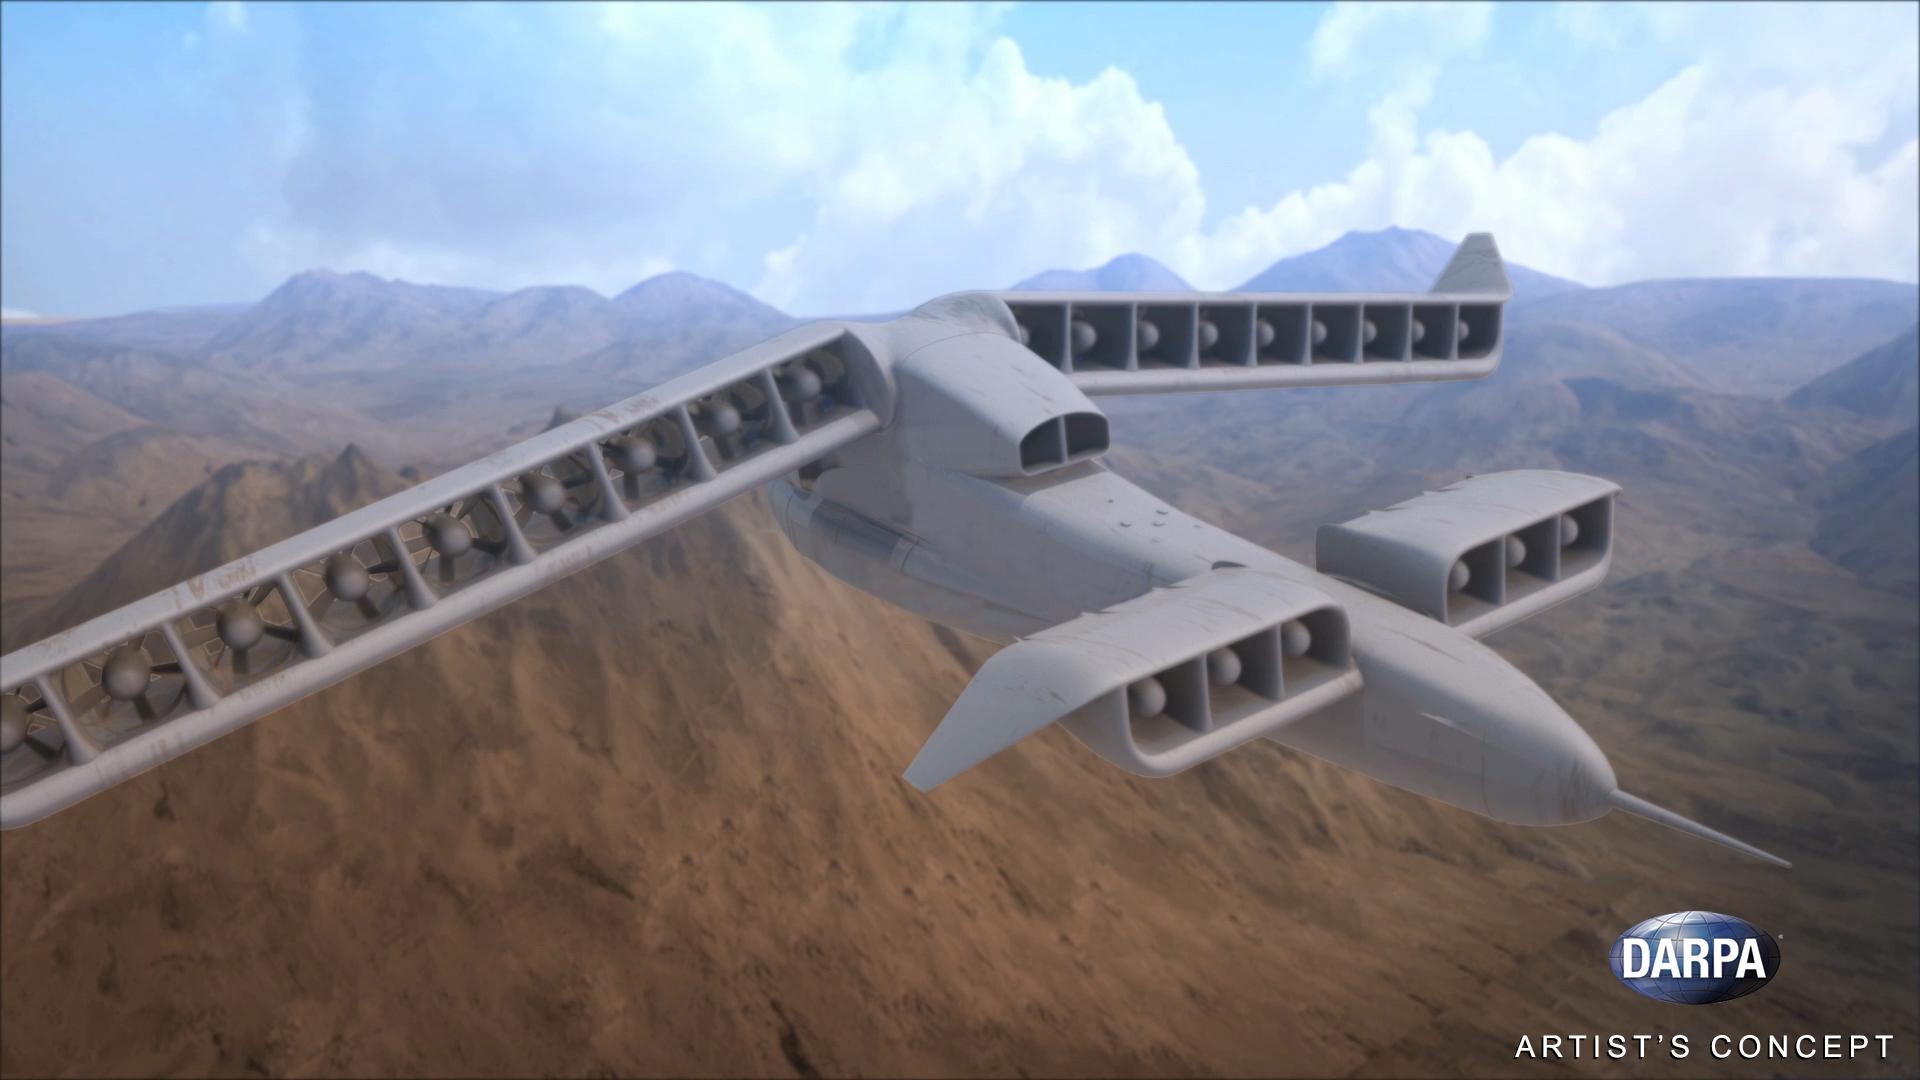 635986614969362644-ARM-VTOL-X-plane-2.JPG